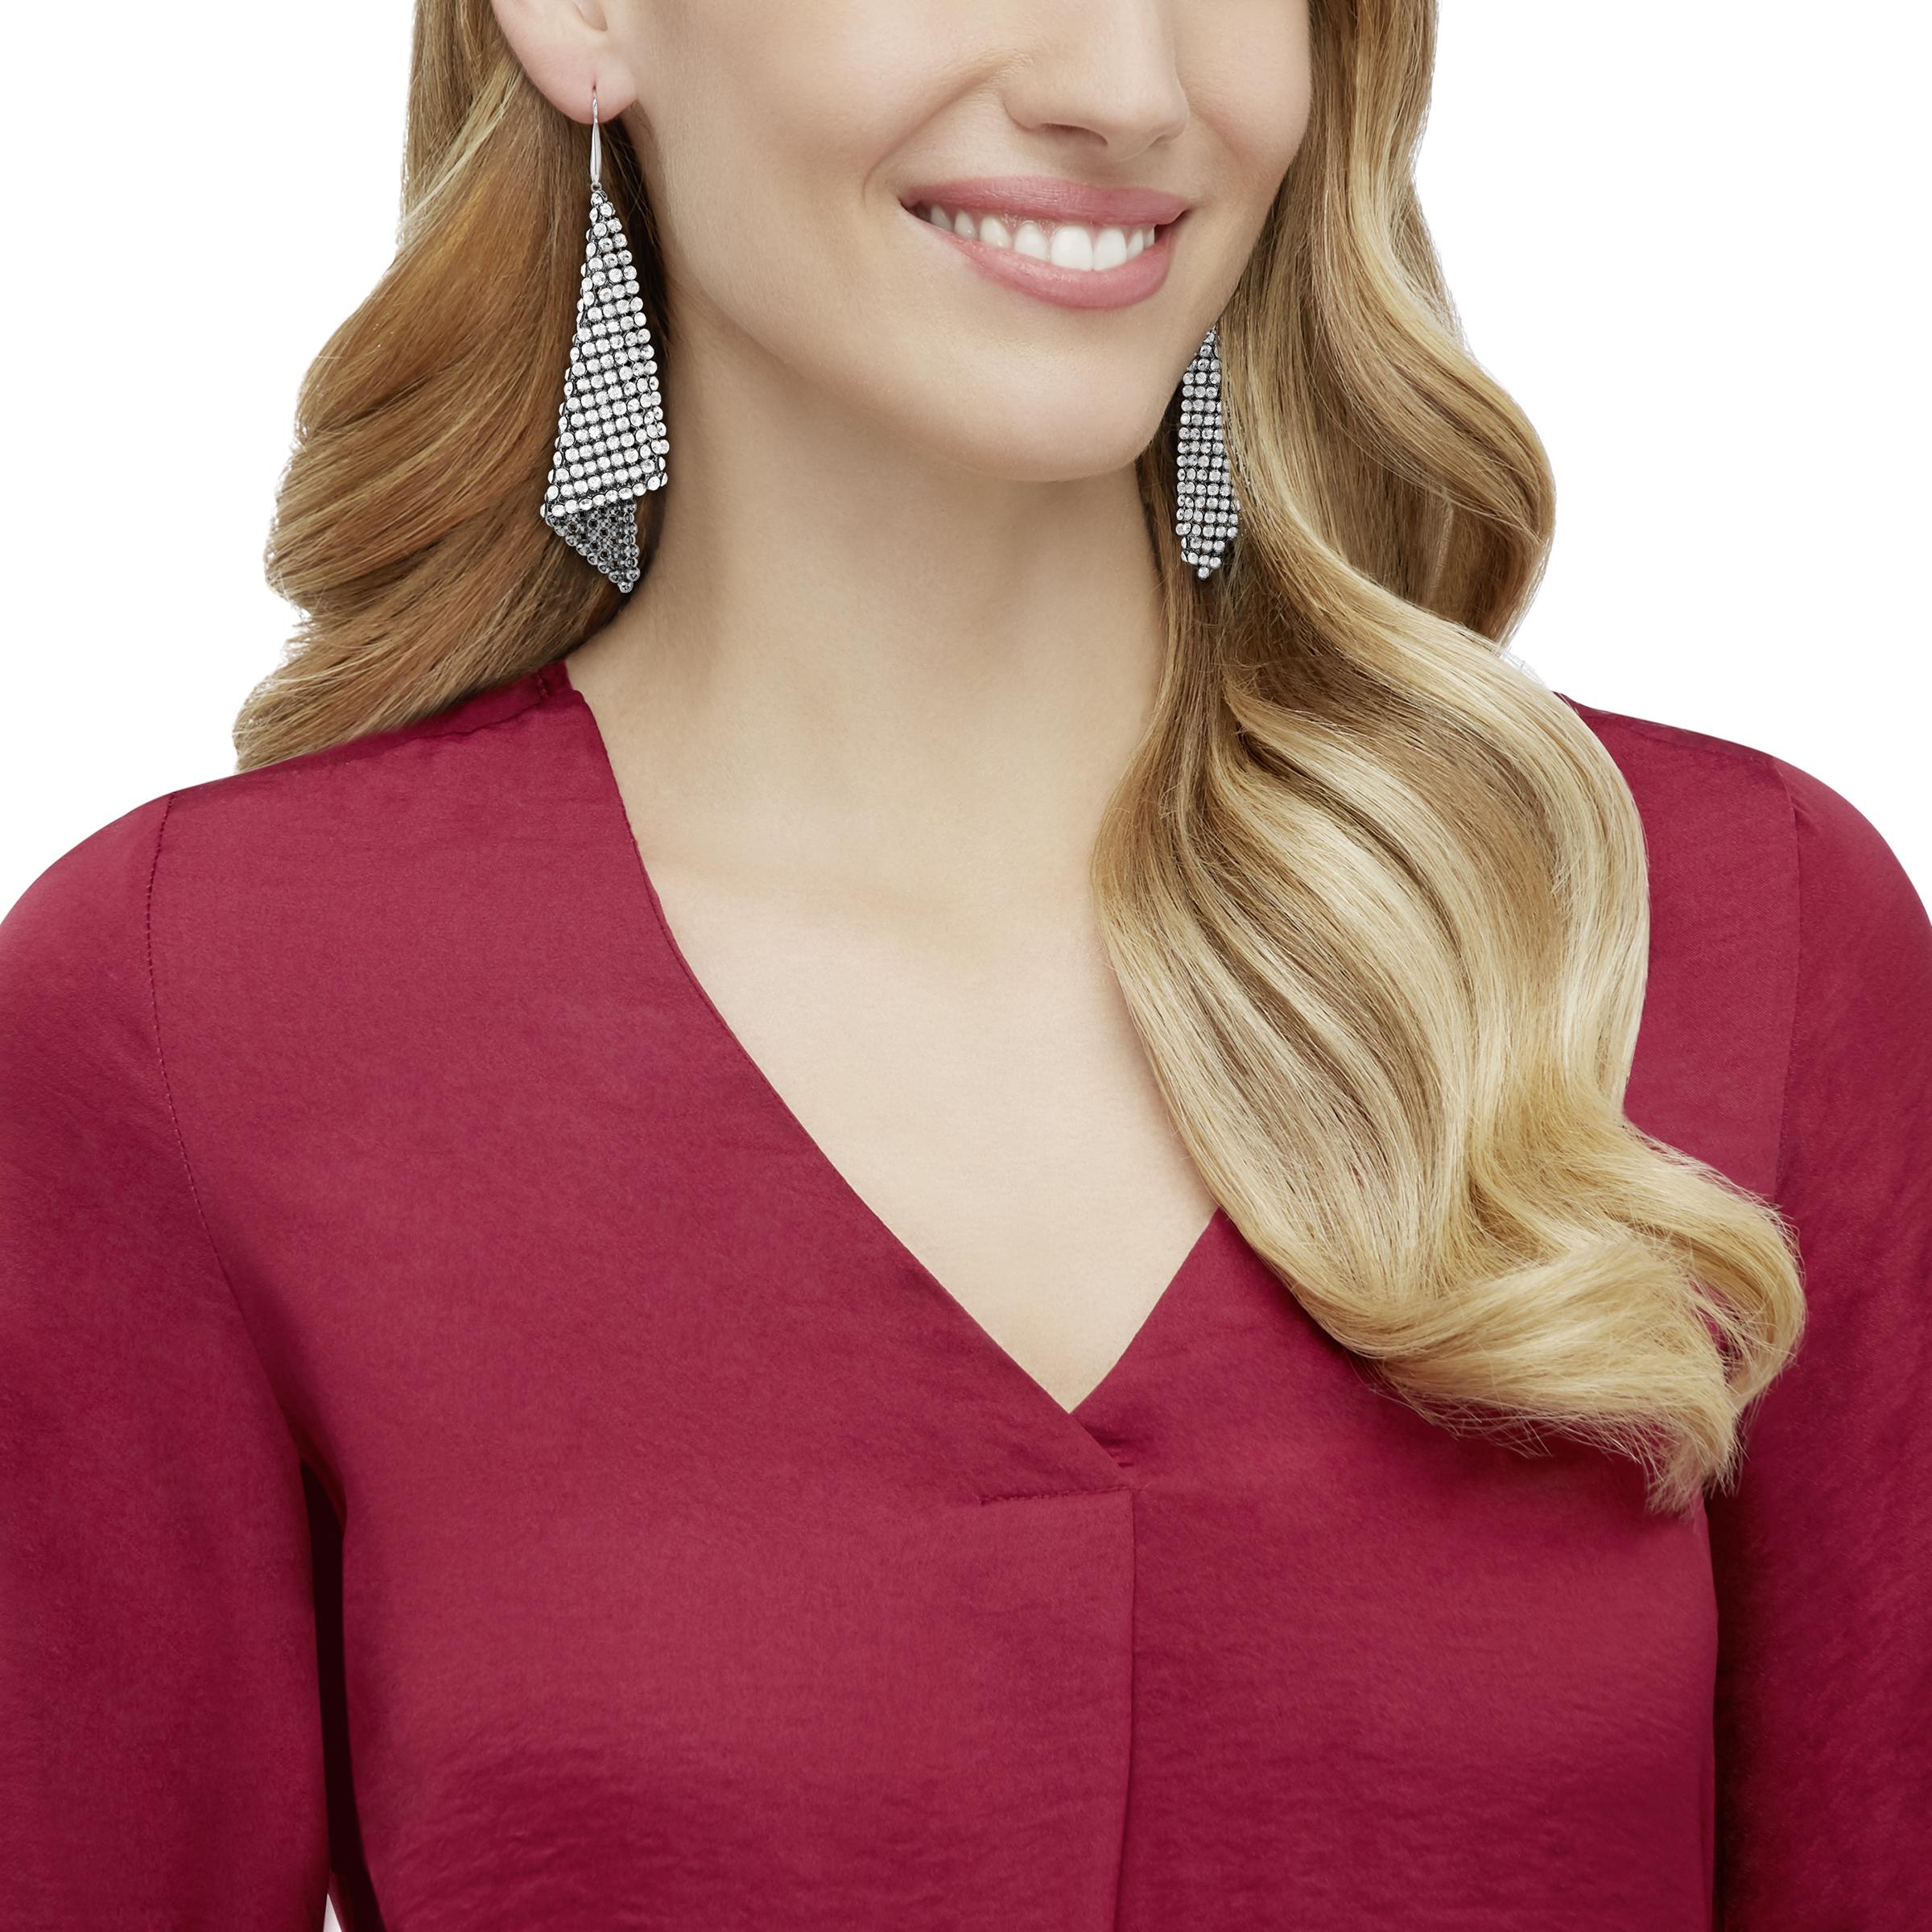 Fit Refresh Pierced Earrings, Gray, Rhodium Plated